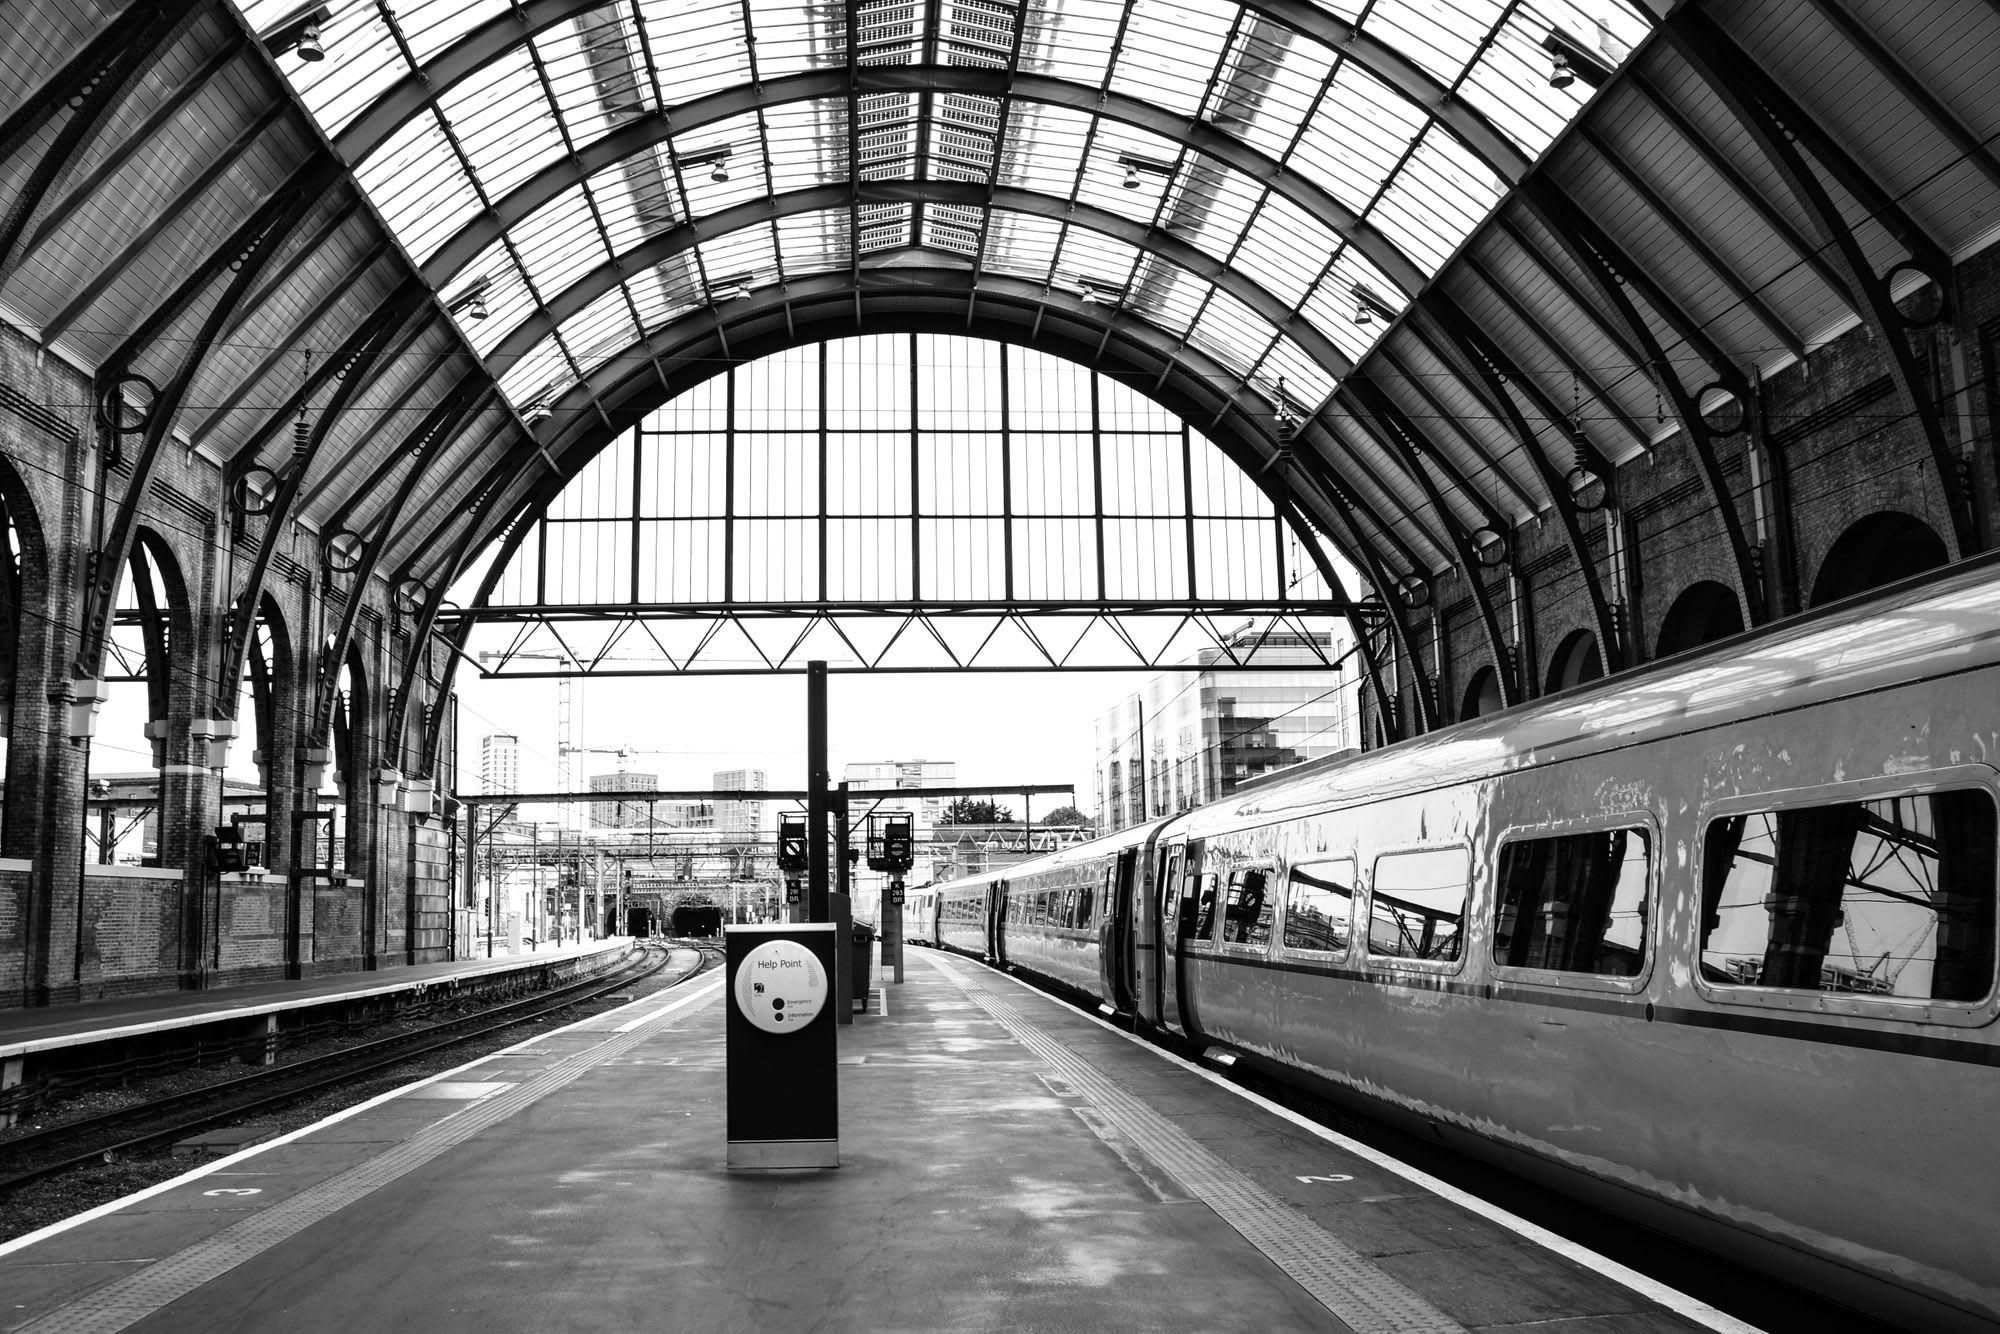 Background Image for Public Transport Data